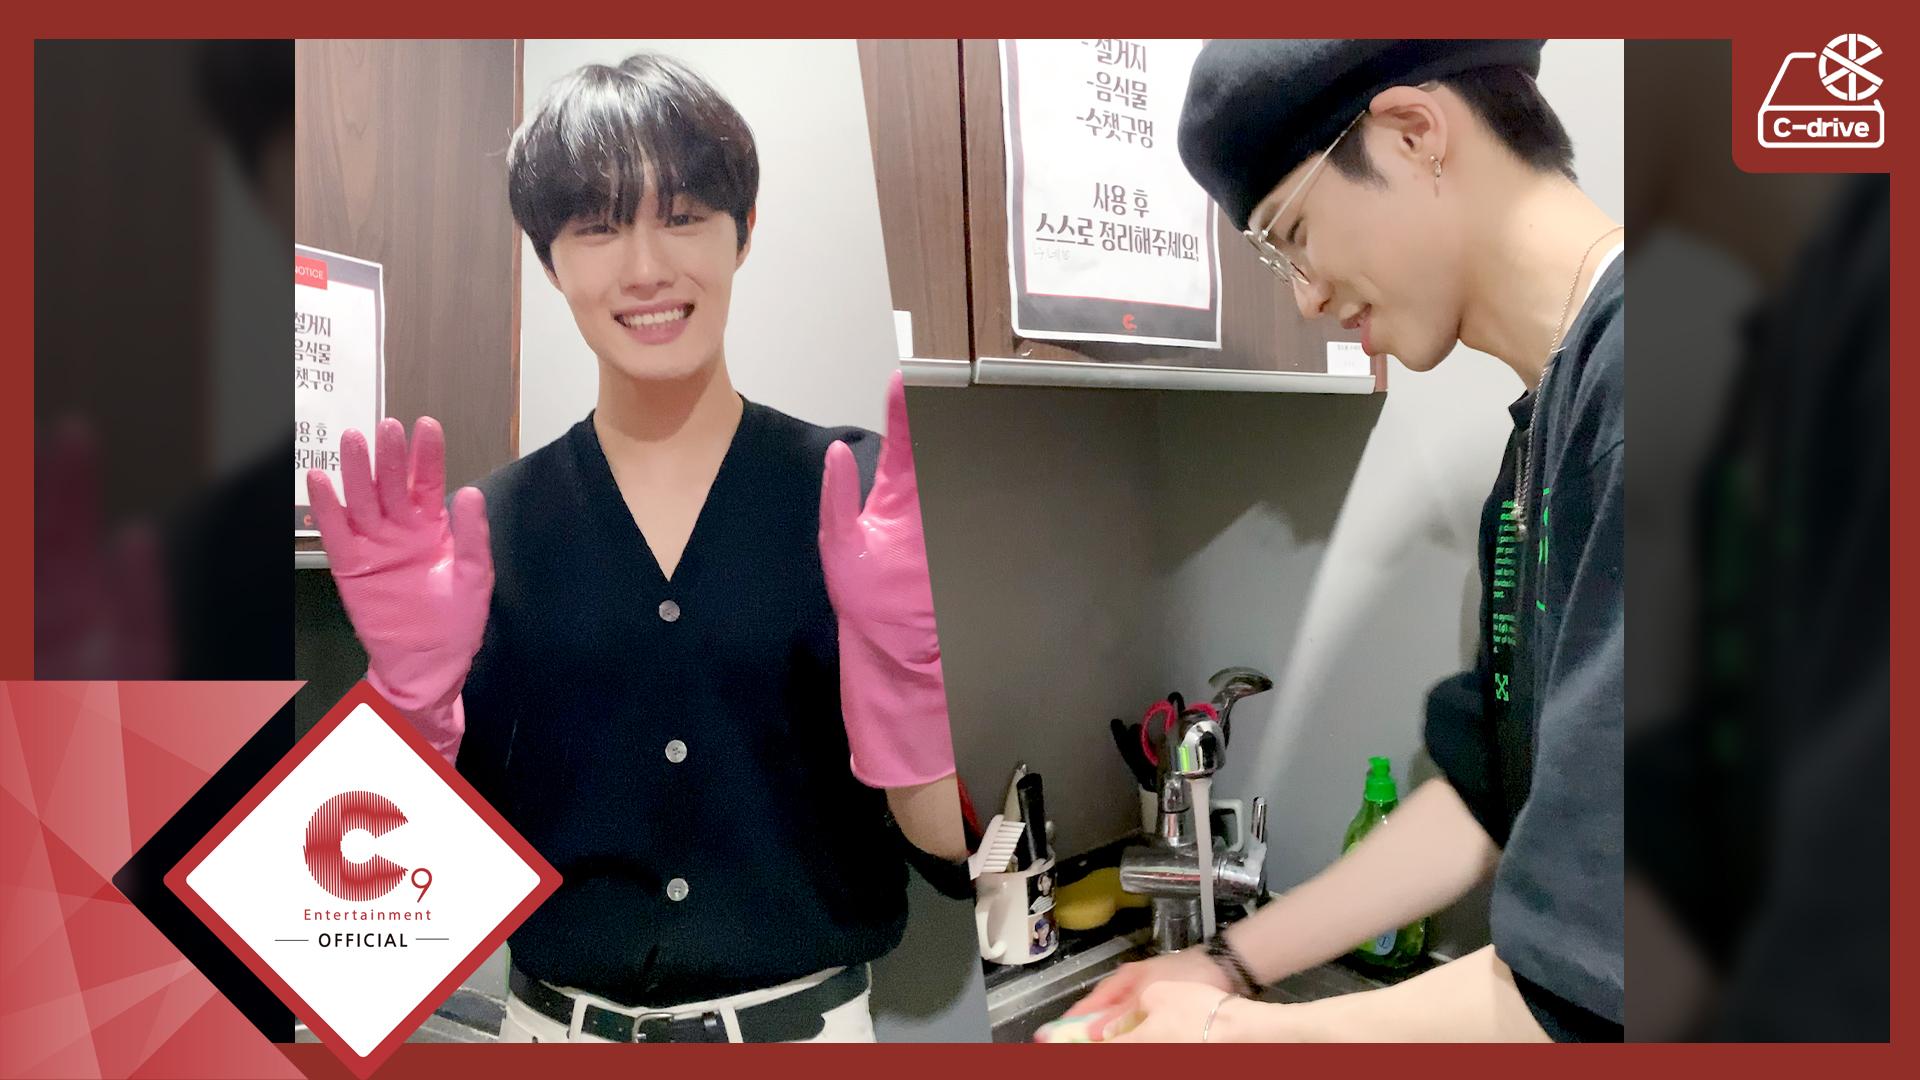 [C-drive] HYUNSUK&BX, washing the dishes